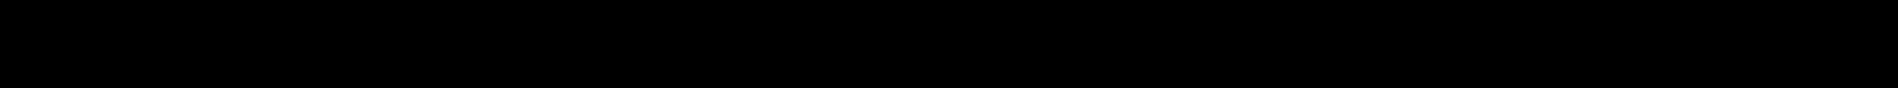 \Pi (n;\phi _{1},k)+\Pi (n;\phi _{2},k)=\Pi \left[n;\arccos {\frac  {\cos \phi _{1}\cos \phi _{2}-\sin \phi _{1}\sin \phi _{2}{\sqrt  {(1-k^{2}\sin ^{2}\phi _{1})(1-k^{2}\sin ^{2}\phi _{2})}}}{1-k^{2}\sin ^{2}\phi _{1}\sin \phi _{2}}},k\right]-{\sqrt  {{\frac  {n}{(1-n)(n-k^{2})}}}}\arctan {\frac  {{\sqrt  {(1-n)n(n-k^{2})}}\sin \arccos {\frac  {\cos \phi _{1}\cos \phi _{2}-\sin \phi _{1}\sin \phi _{2}{\sqrt  {(1-k^{2}\sin ^{2}\phi _{1})(1-k^{2}\sin ^{2}\phi _{2})}}}{1-k^{2}\sin ^{2}\phi _{1}\sin \phi _{2}}}\sin \phi _{1}\sin \phi _{2}}{{\frac  {n\cos \phi _{1}\cos \phi _{2}-n\sin \phi _{1}\sin \phi _{2}{\sqrt  {(1-k^{2}\sin ^{2}\phi _{1})(1-k^{2}\sin ^{2}\phi _{2})}}}{1-k^{2}\sin ^{2}\phi _{1}\sin \phi _{2}}}{\sqrt  {1-k^{2}\sin ^{2}\arccos {\frac  {\cos \phi _{1}\cos \phi _{2}-\sin \phi _{1}\sin \phi _{2}{\sqrt  {(1-k^{2}\sin ^{2}\phi _{1})(1-k^{2}\sin ^{2}\phi _{2})}}}{1-k^{2}\sin ^{2}\phi _{1}\sin \phi _{2}}}}}\sin \phi _{1}\sin \phi _{2}+1-n\sin ^{2}\arccos {\frac  {\cos \phi _{1}\cos \phi _{2}-\sin \phi _{1}\sin \phi _{2}{\sqrt  {(1-k^{2}\sin ^{2}\phi _{1})(1-k^{2}\sin ^{2}\phi _{2})}}}{1-k^{2}\sin ^{2}\phi _{1}\sin \phi _{2}}}}}